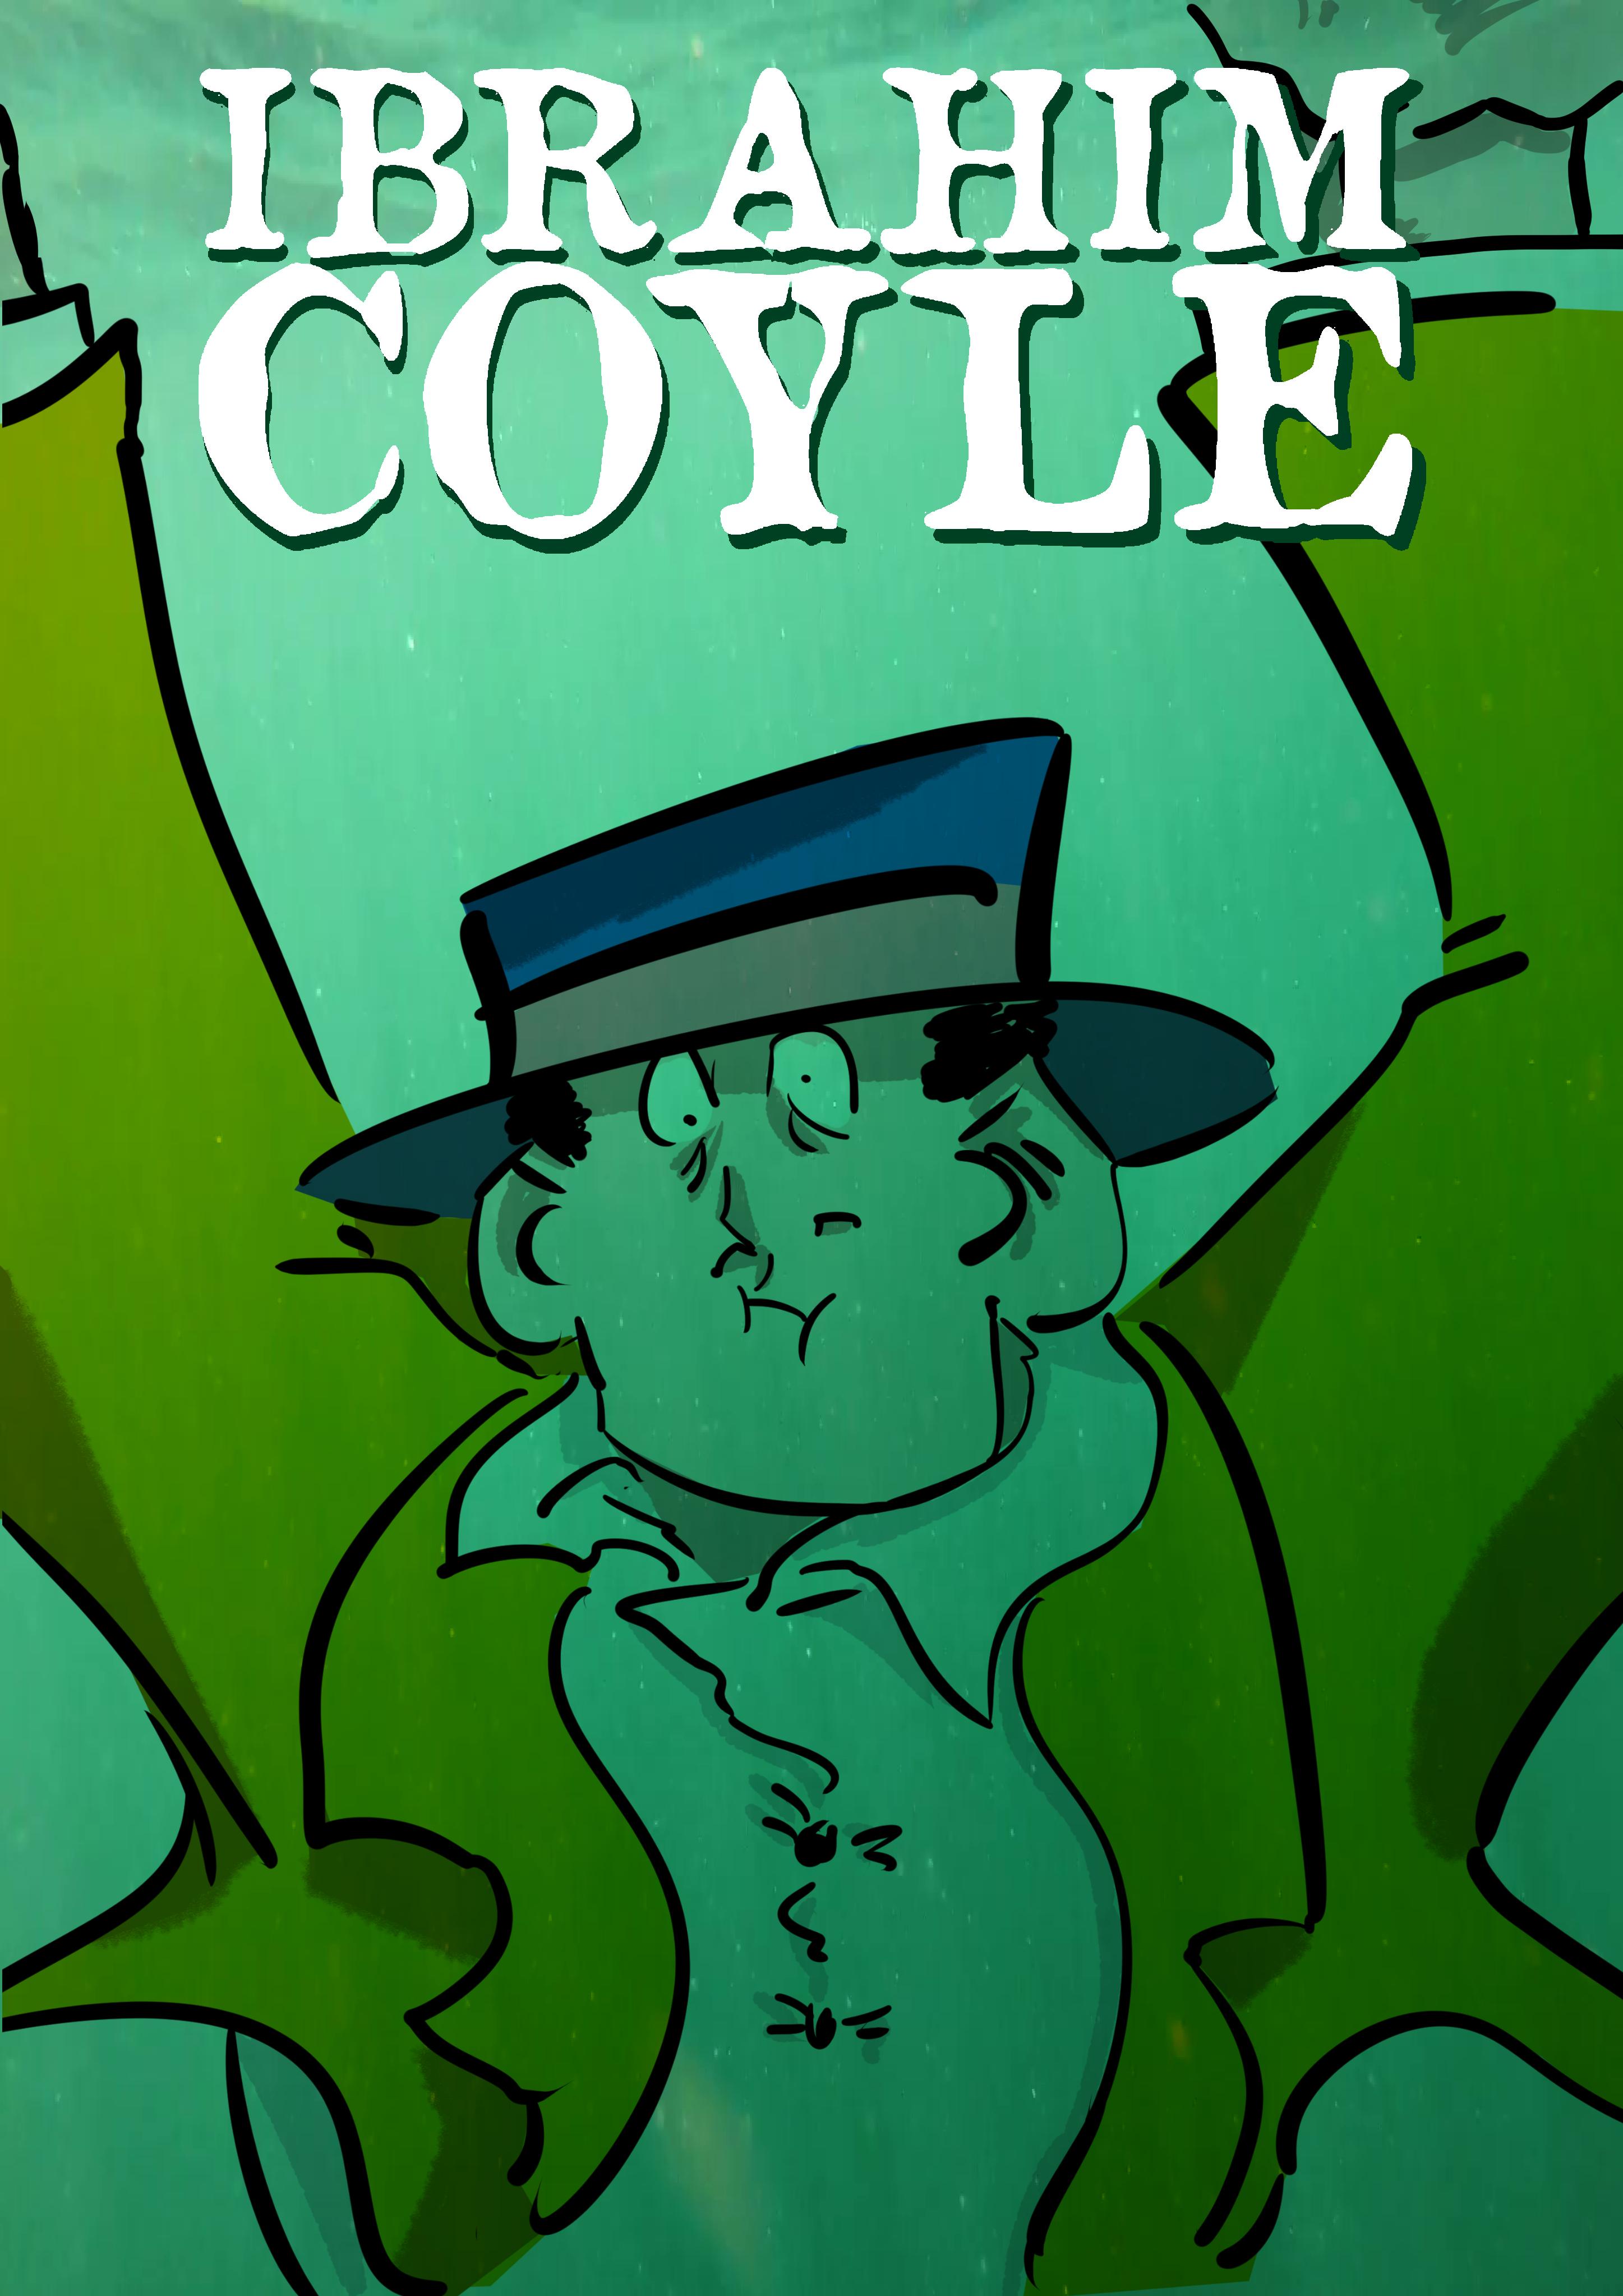 Ibrahim Coyle #18